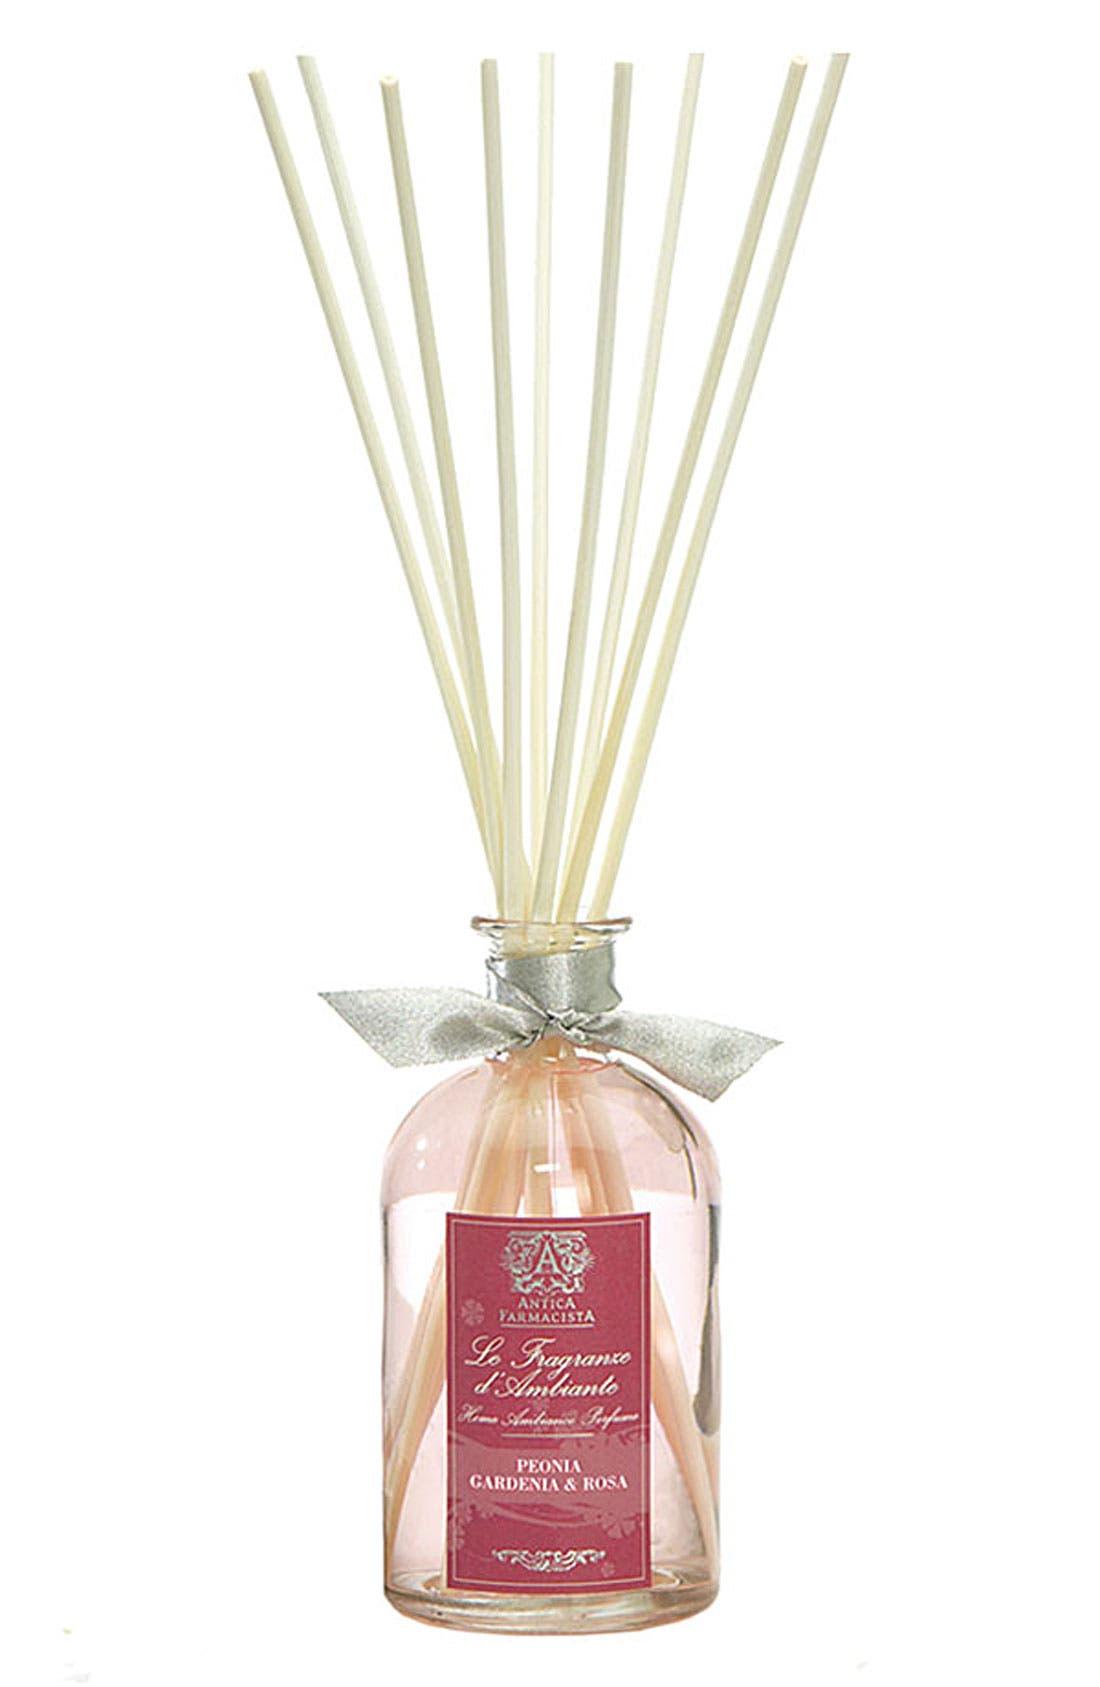 Alternate Image 1 Selected - Antica Farmacista 'Peonia Gardenia & Rosa' Home Ambiance Perfume